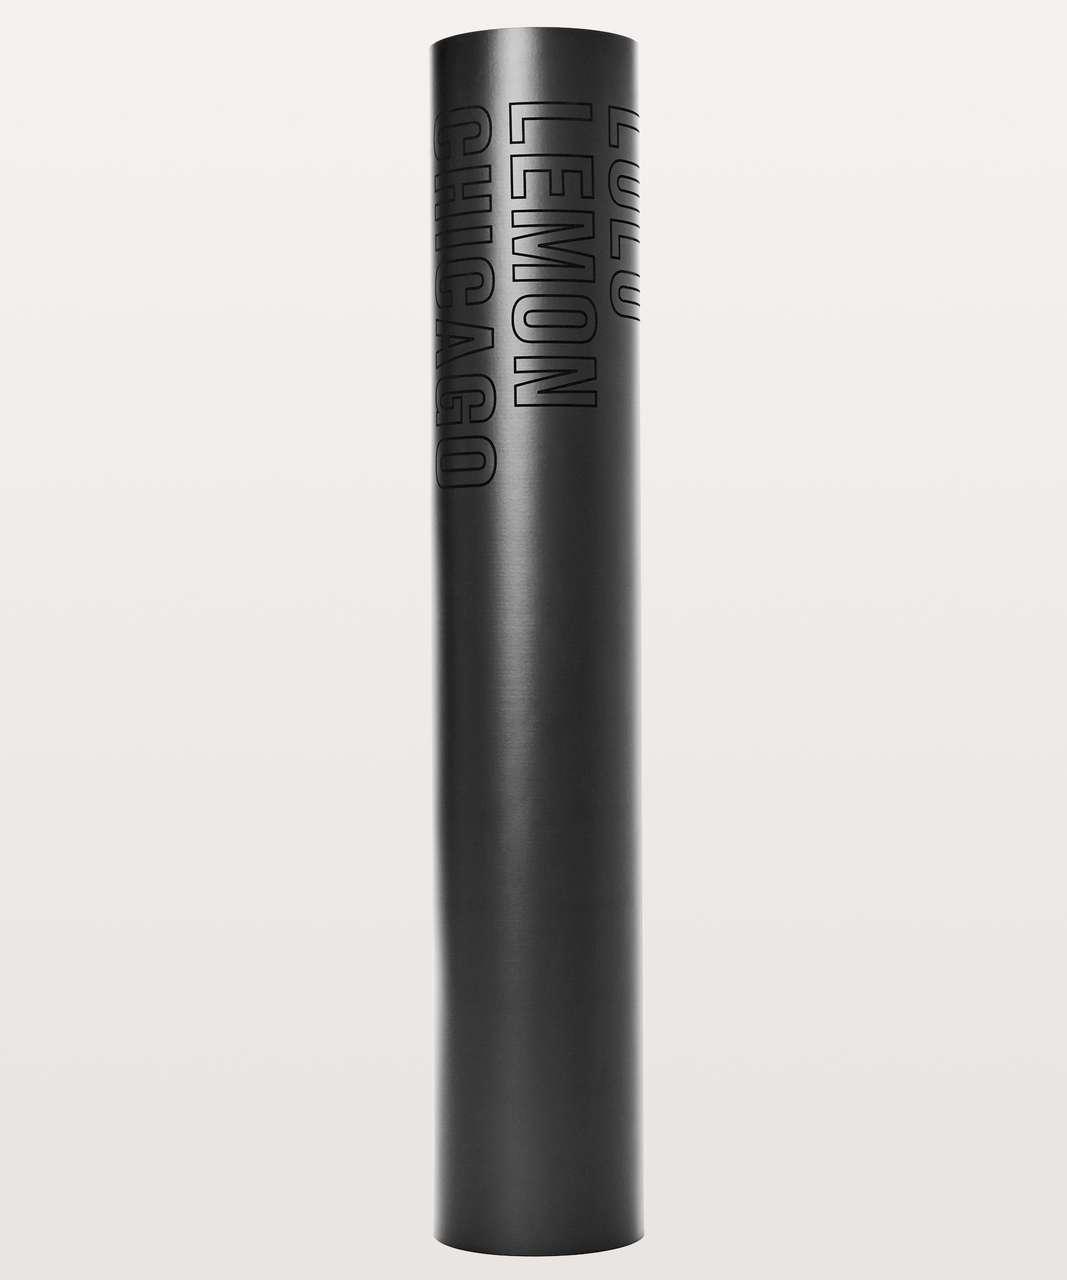 Lululemon The Reversible Mat 5mm Chicago - My City Mat Chicago